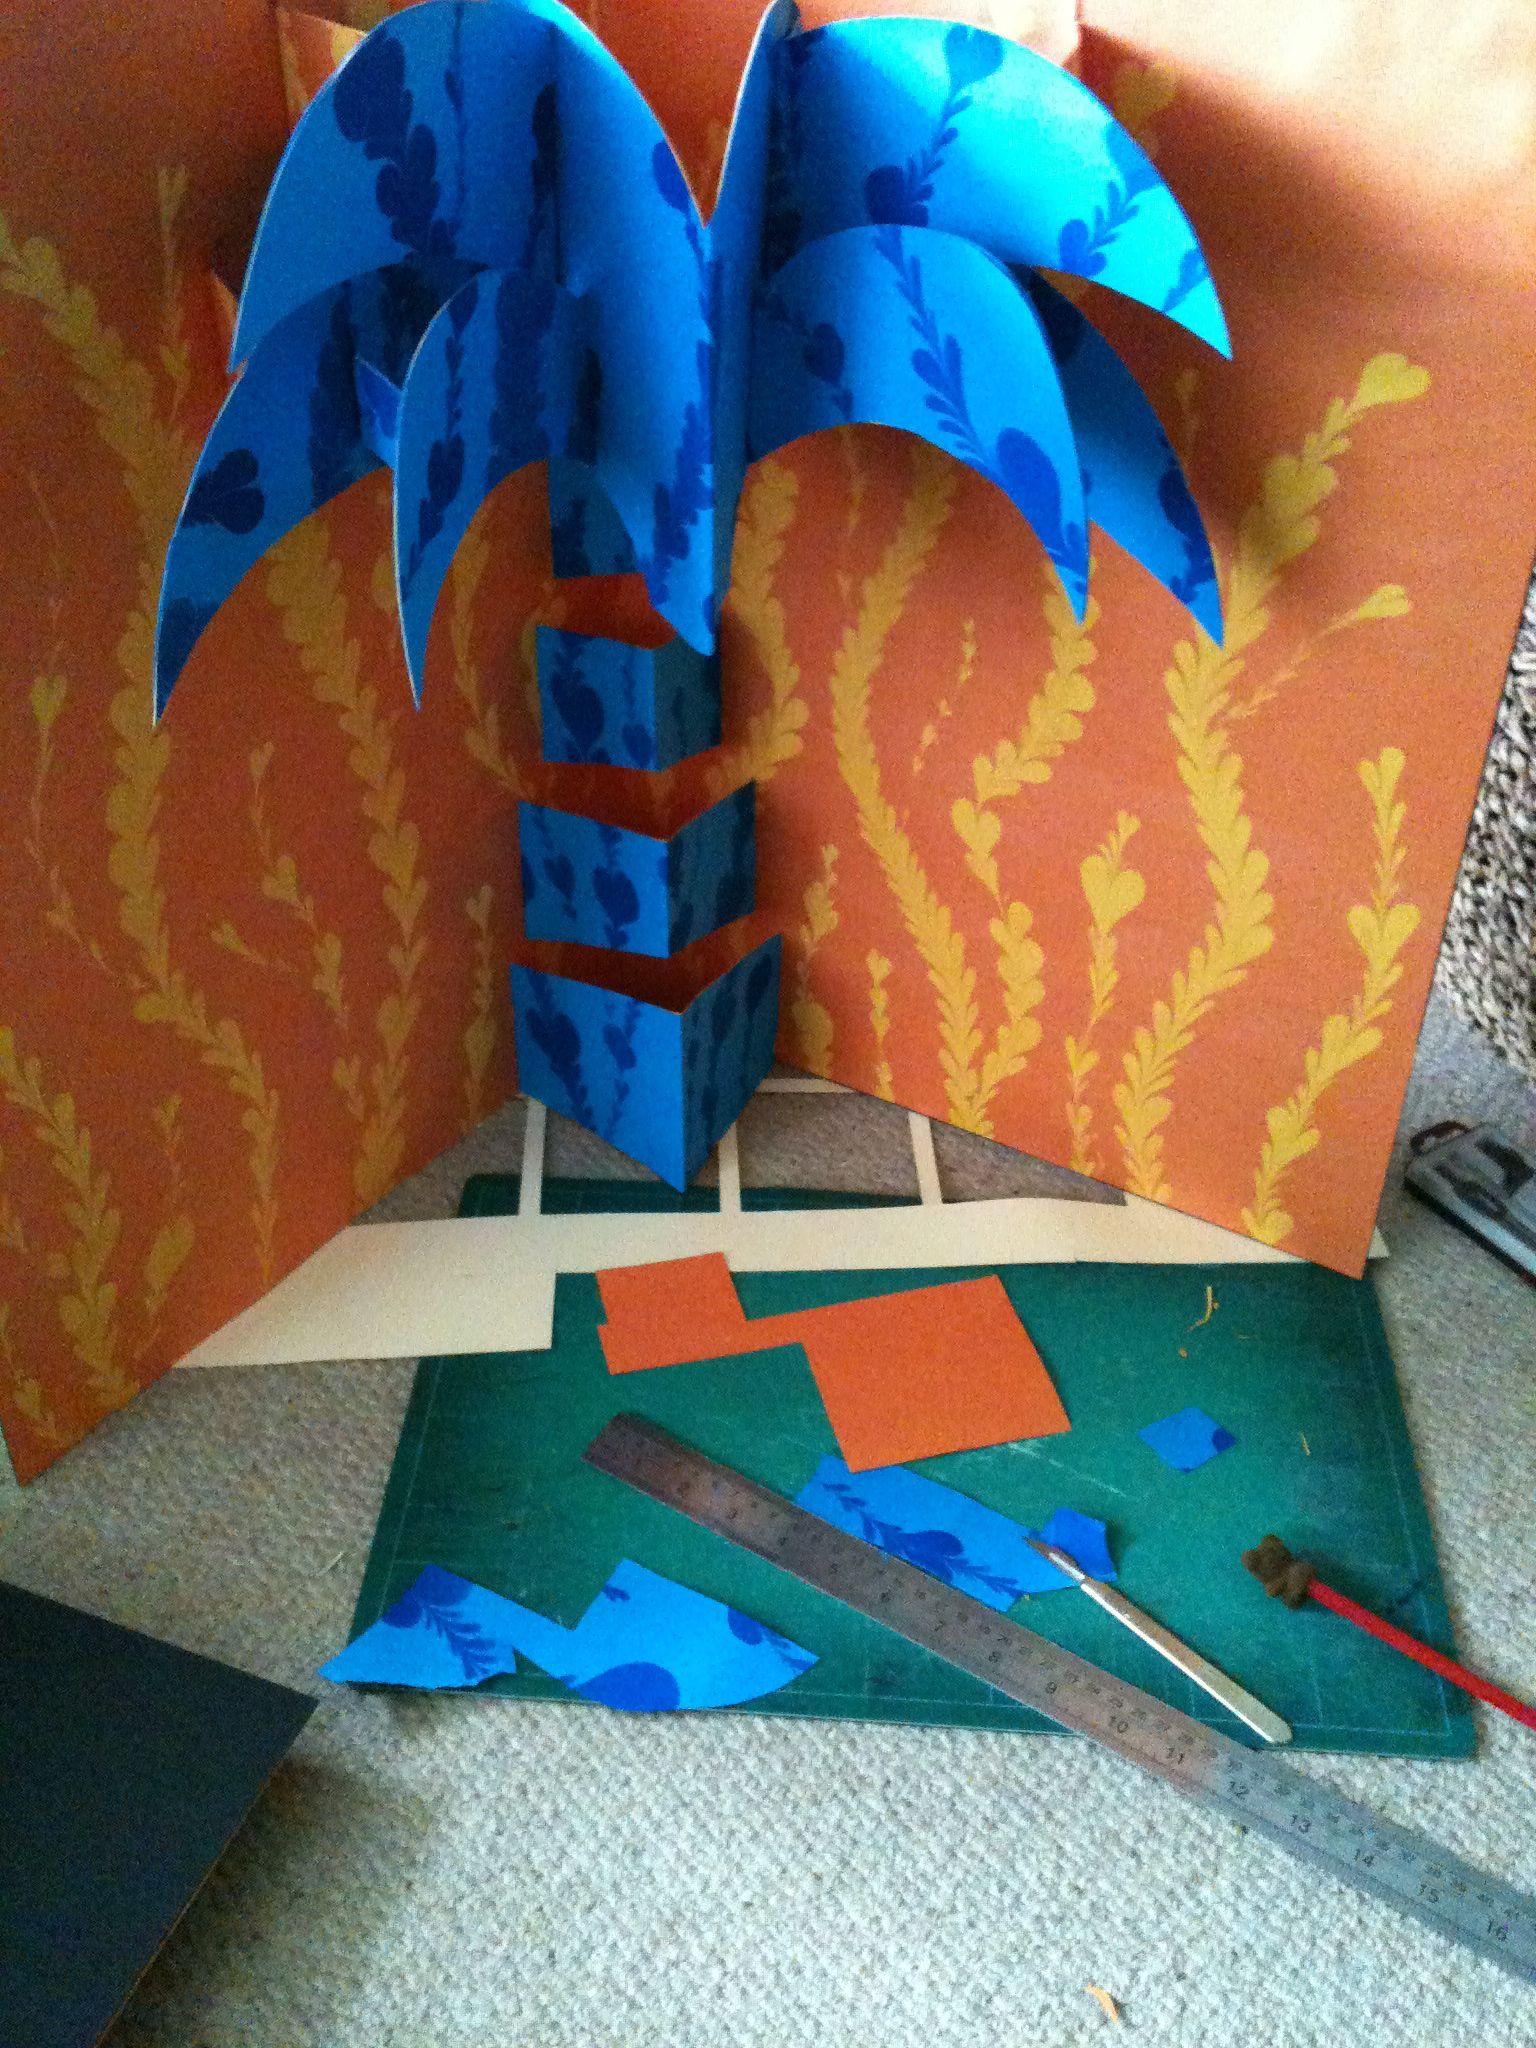 Hannah Kokoschka pop-up palm tree artwork